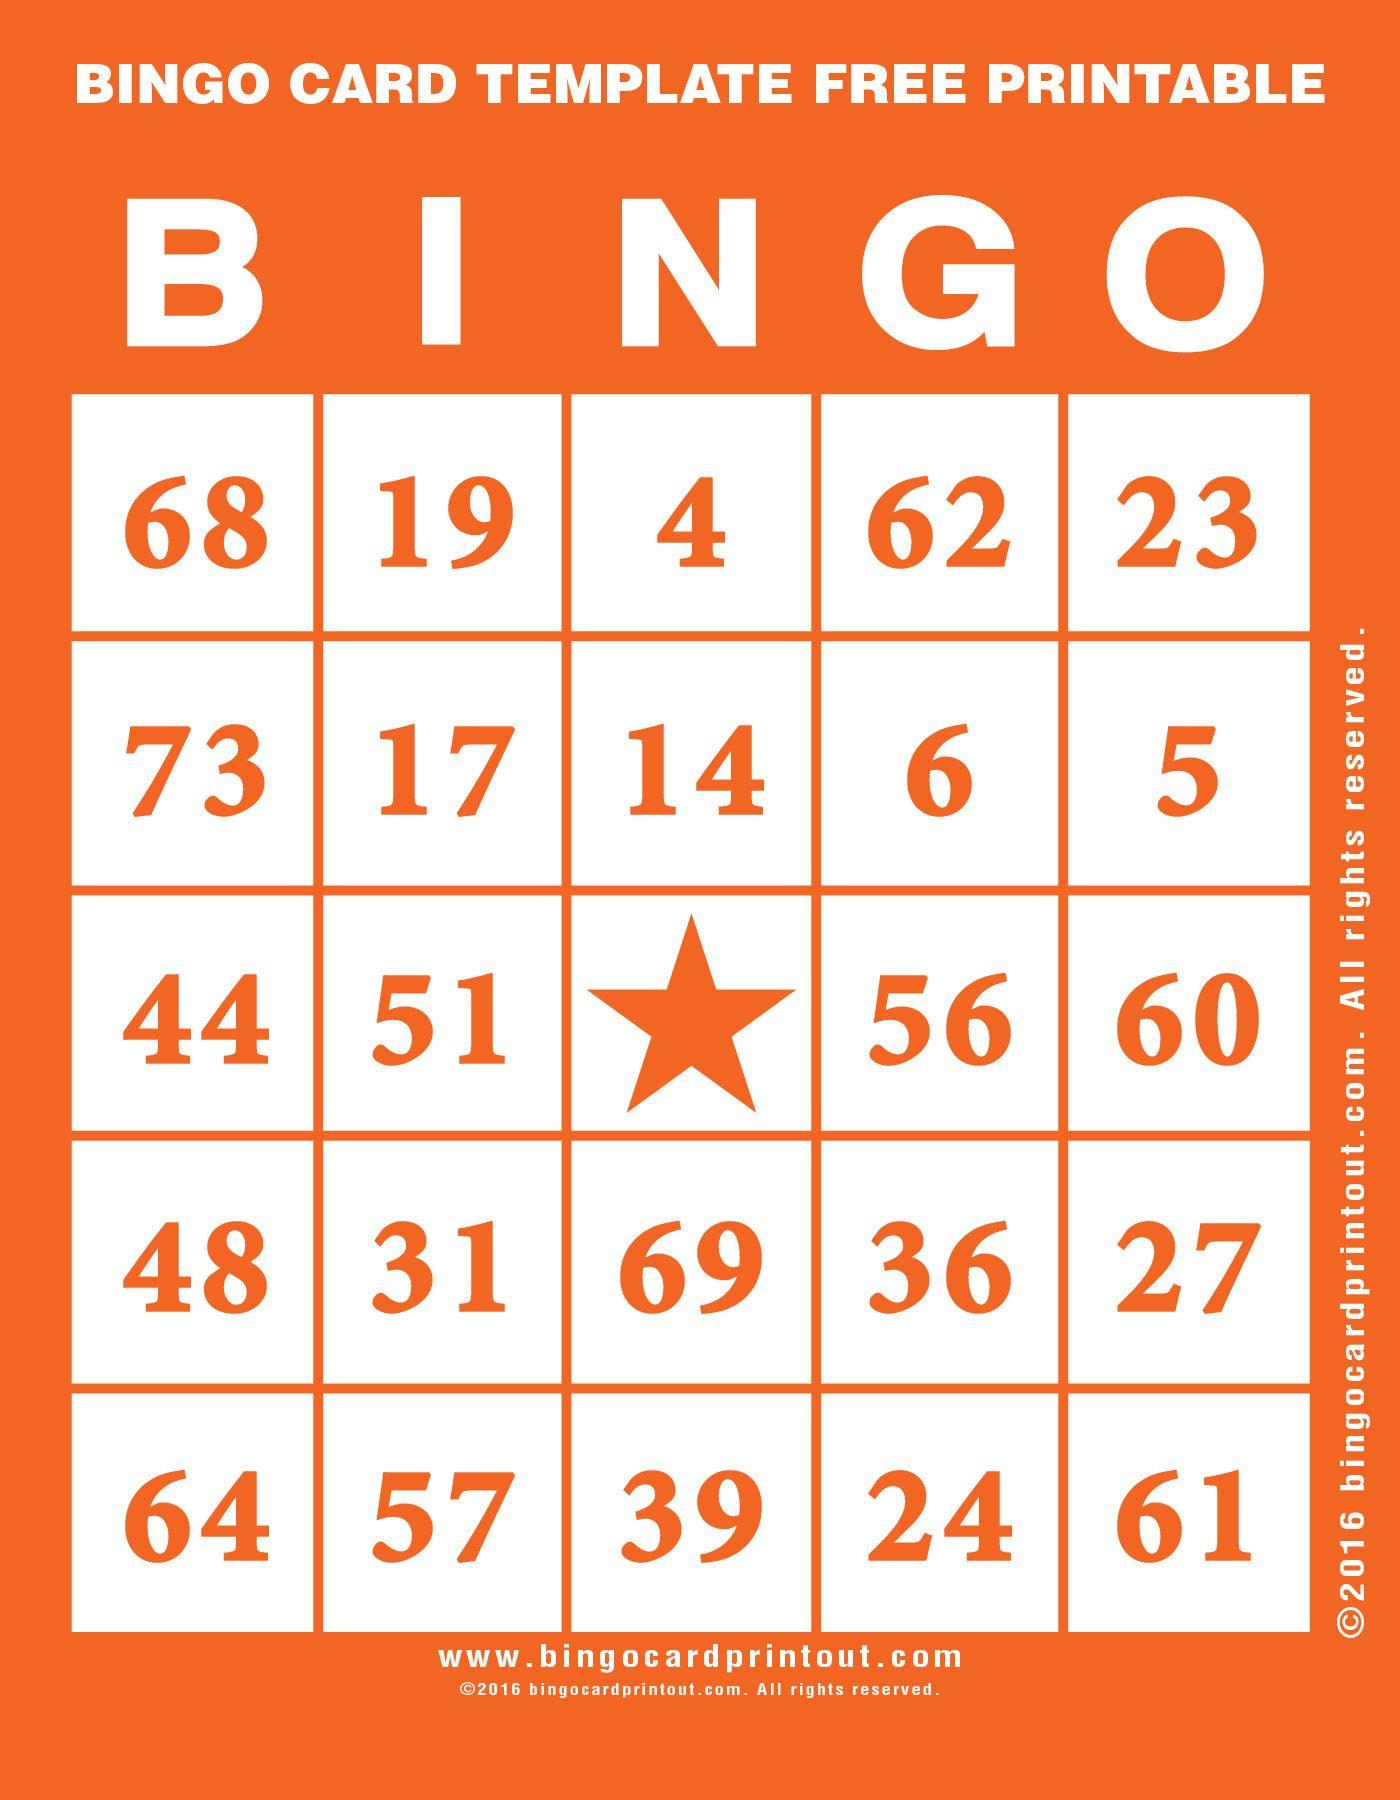 Bingo Card Template Free Printable | Bingo Card Template